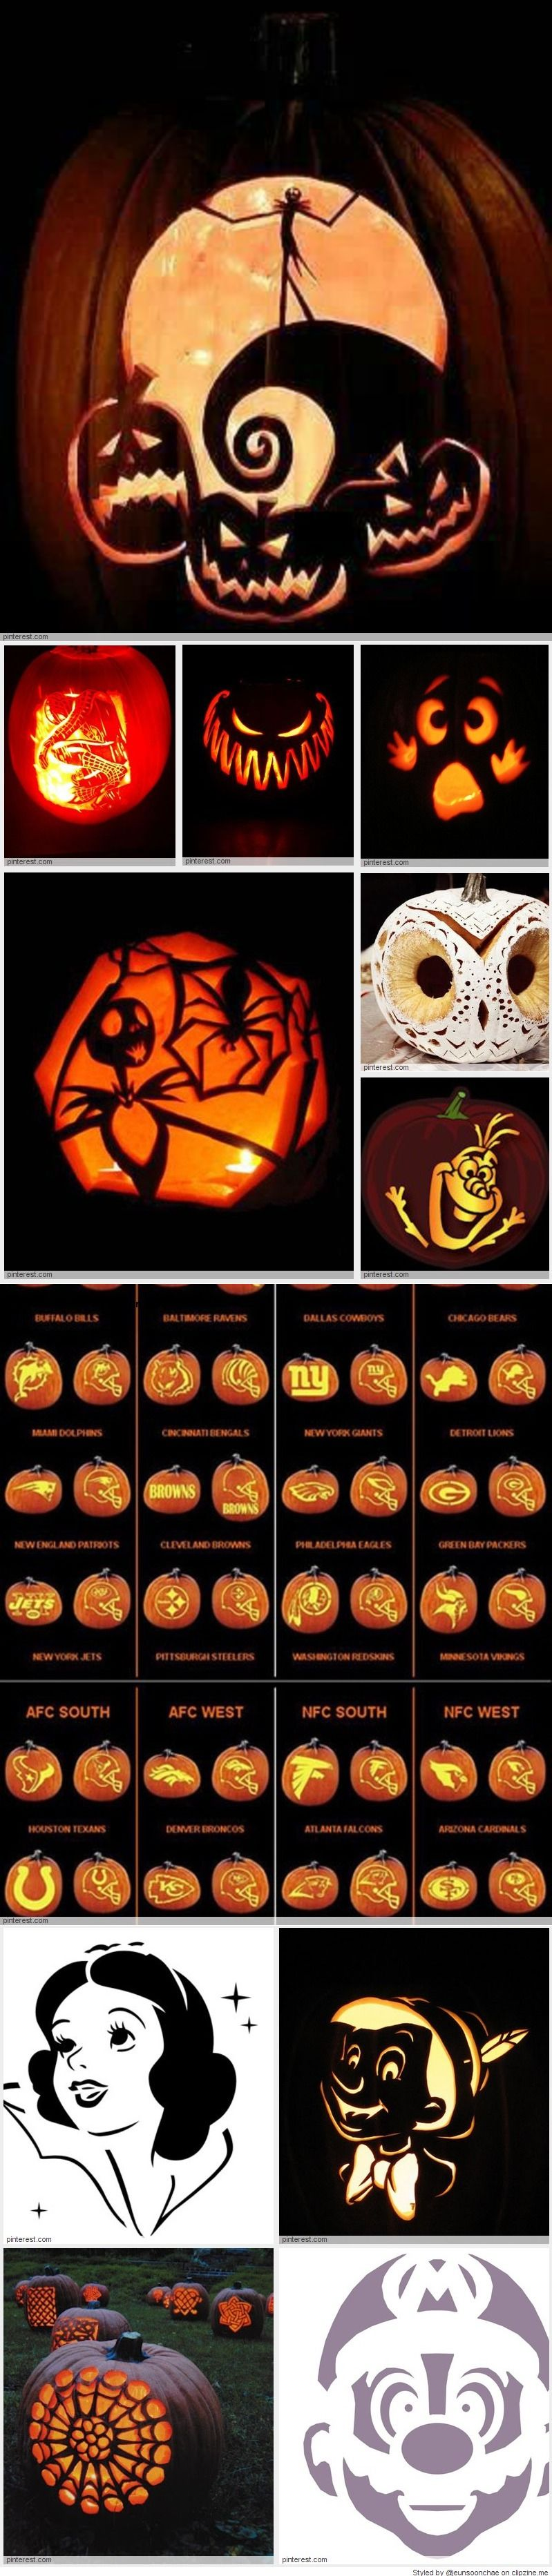 Pumpkin Carving Patterns Jack Sally Pumpkin Carving Patterns